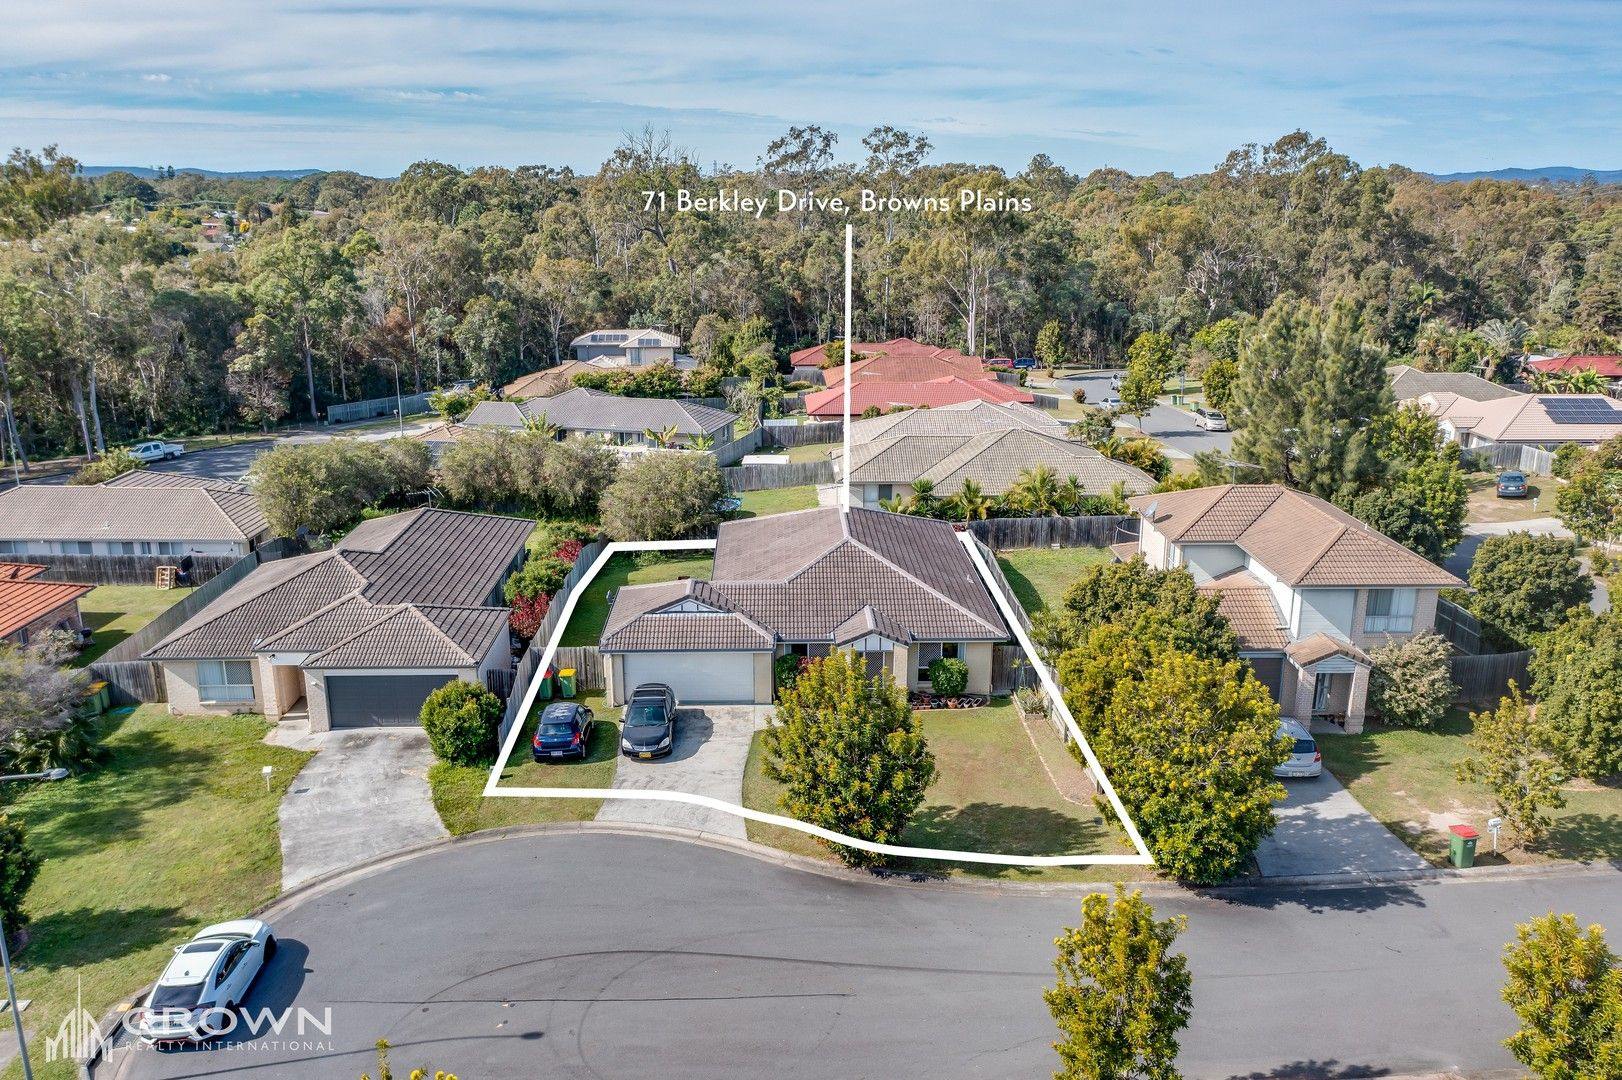 71 Berkley Drive, Browns Plains QLD 4118, Image 0